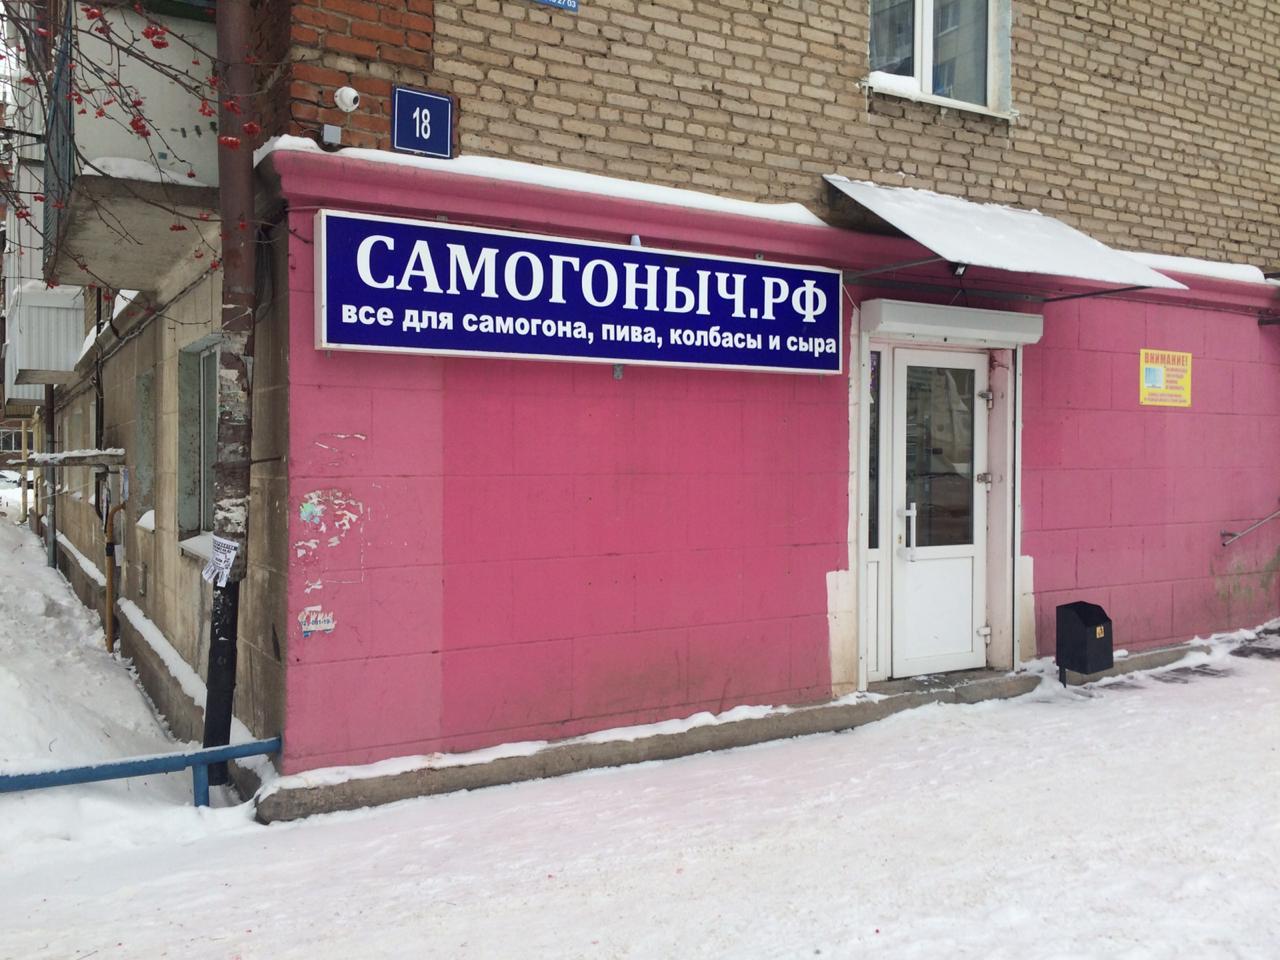 https://samogongonim.ru/images/upload/Обская%2018.jpg